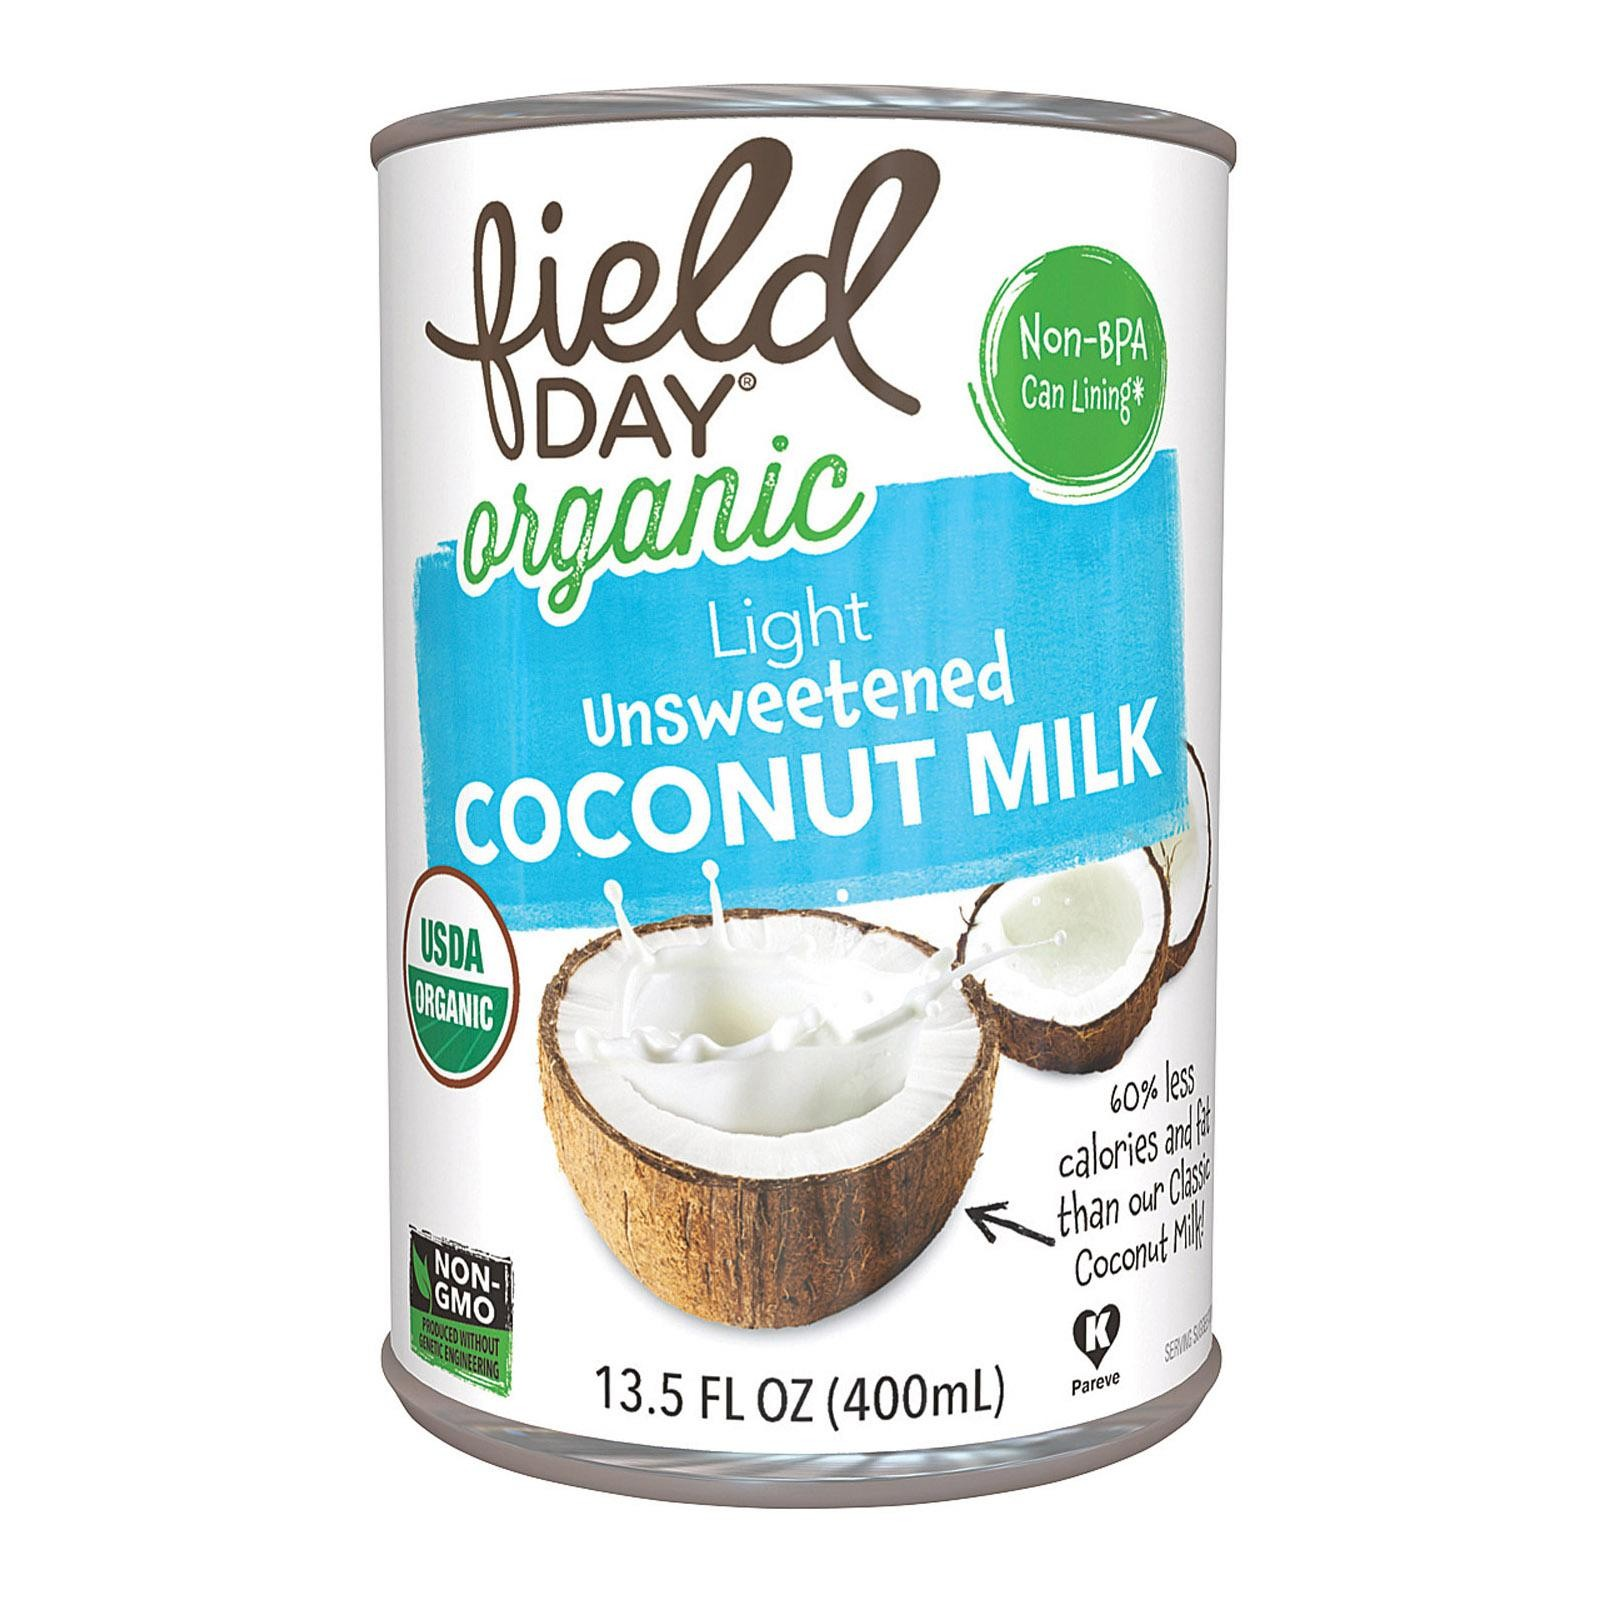 Field Day Organic Light Unsweetened Coconut Milk - Coconut Milk - pack of 12 - 13.5 Fl Oz.